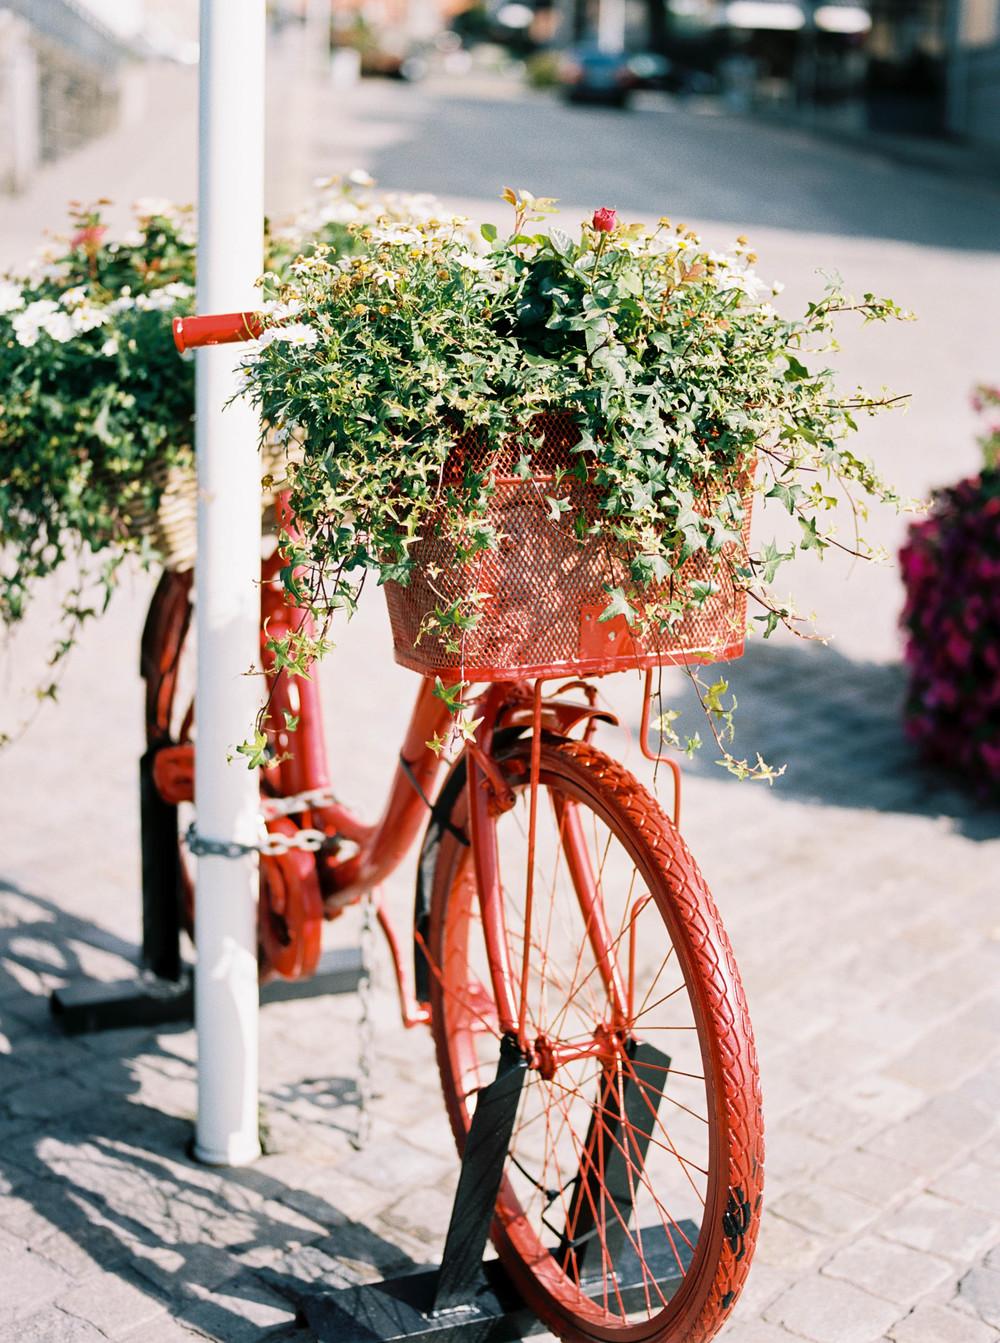 Alyssa Joy Photography - Haugesund, Norway travel photographer